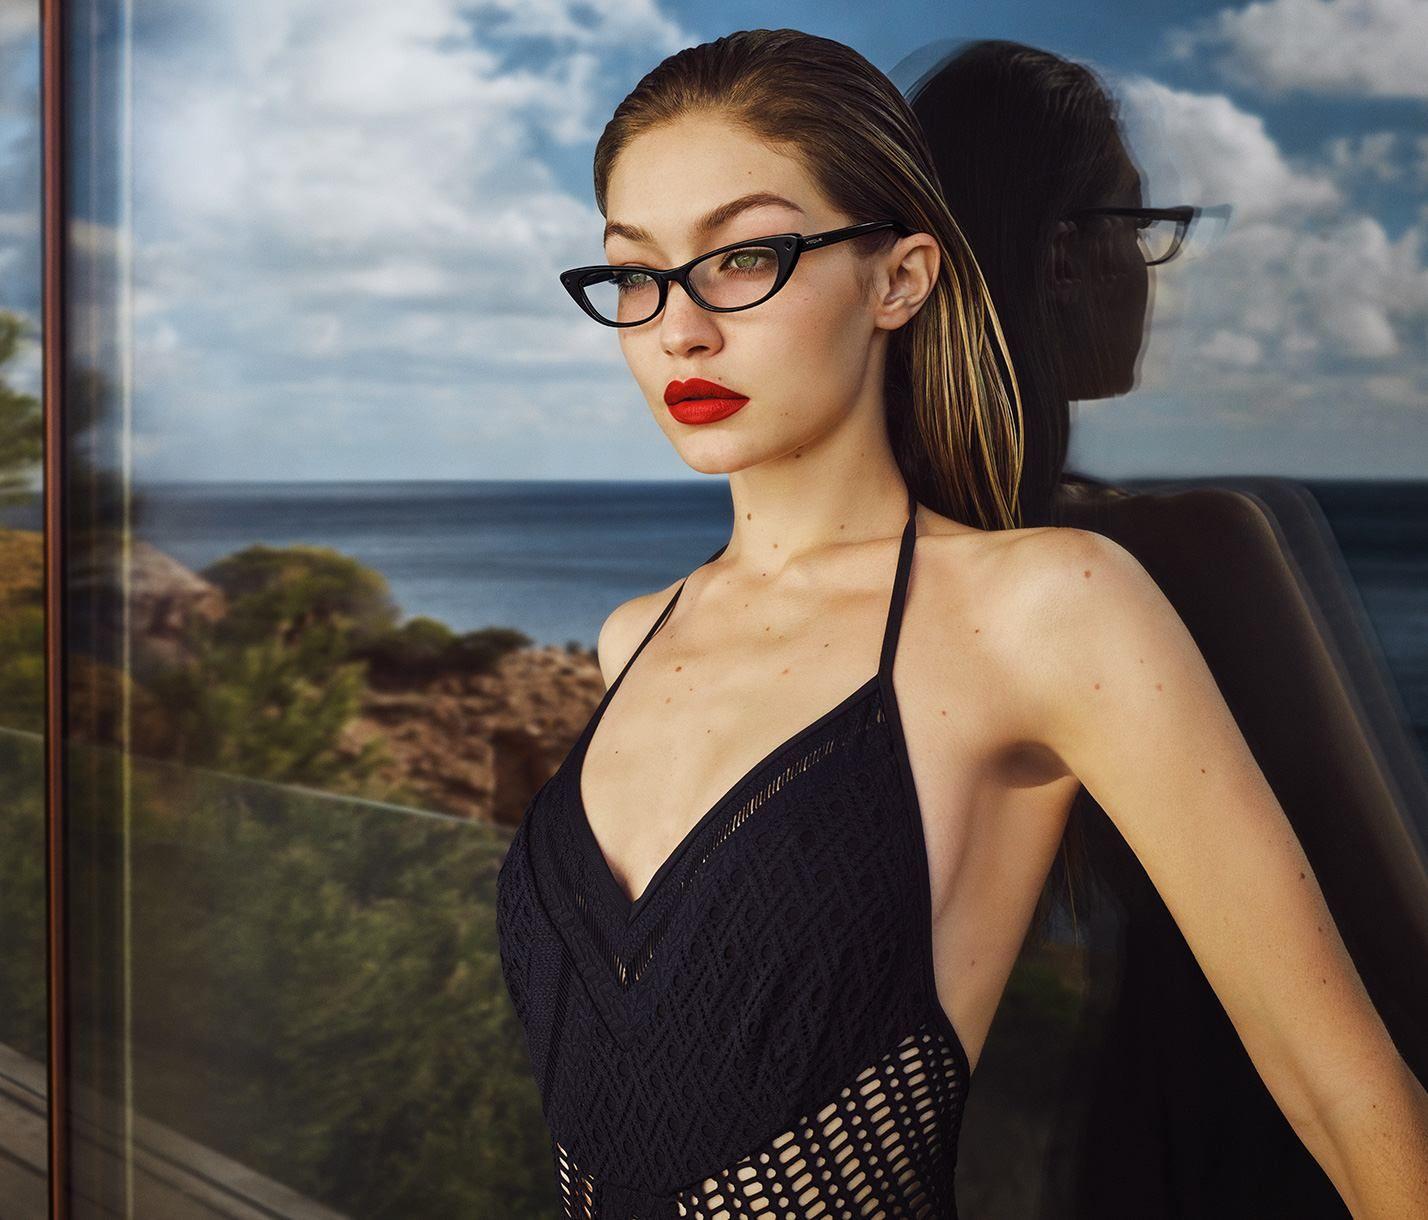 001ac50dc6 Gigi Hadid For Vogue Shoot